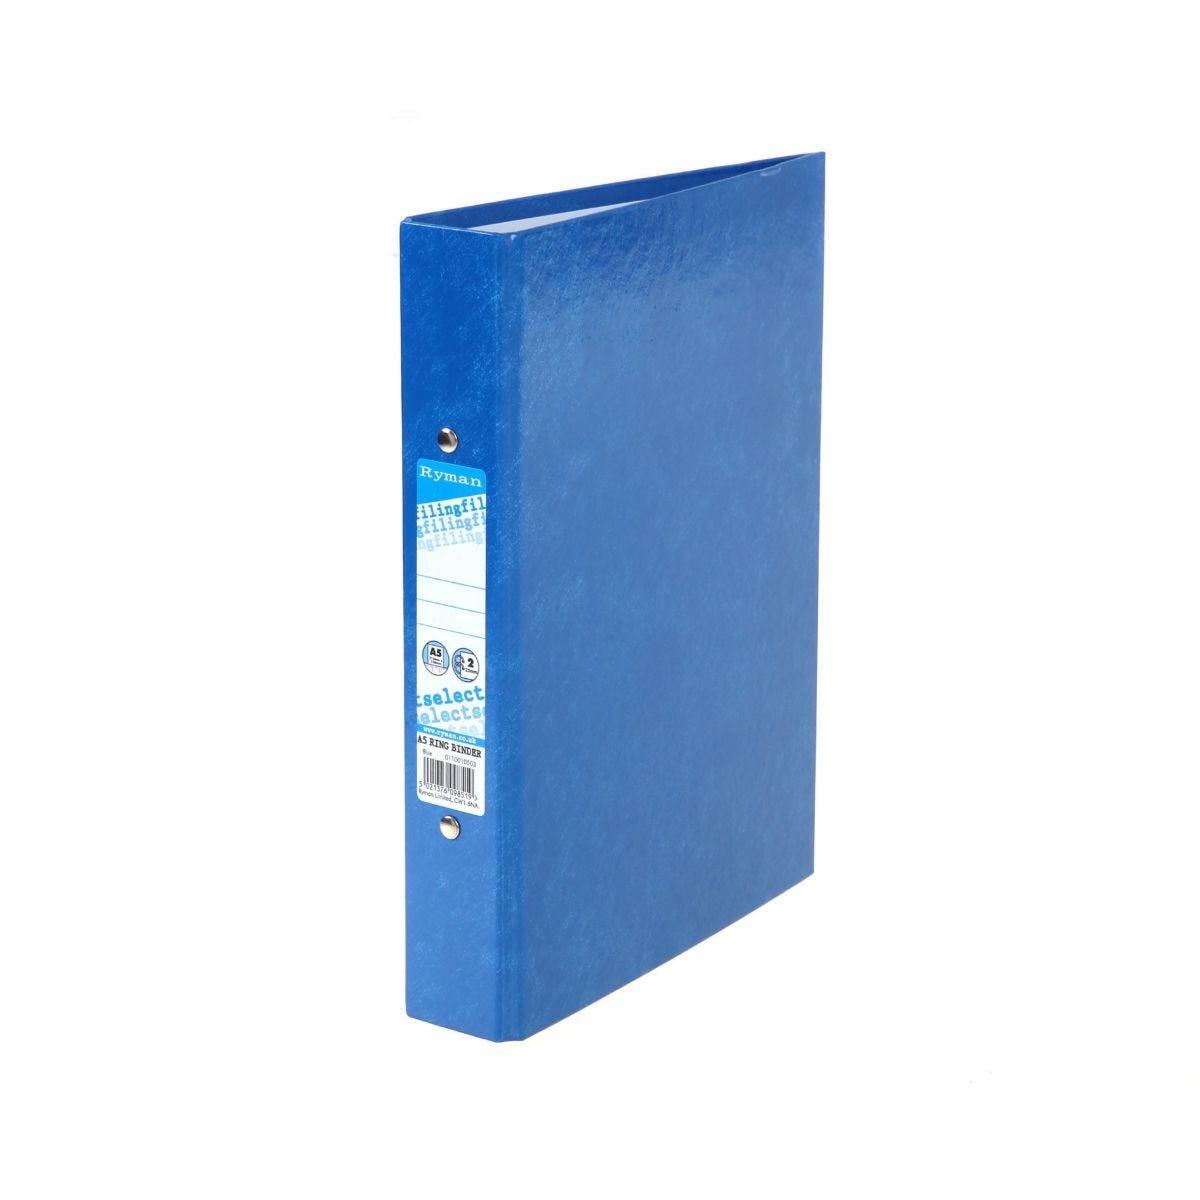 Ryman Select Ring Binder A5 Blue